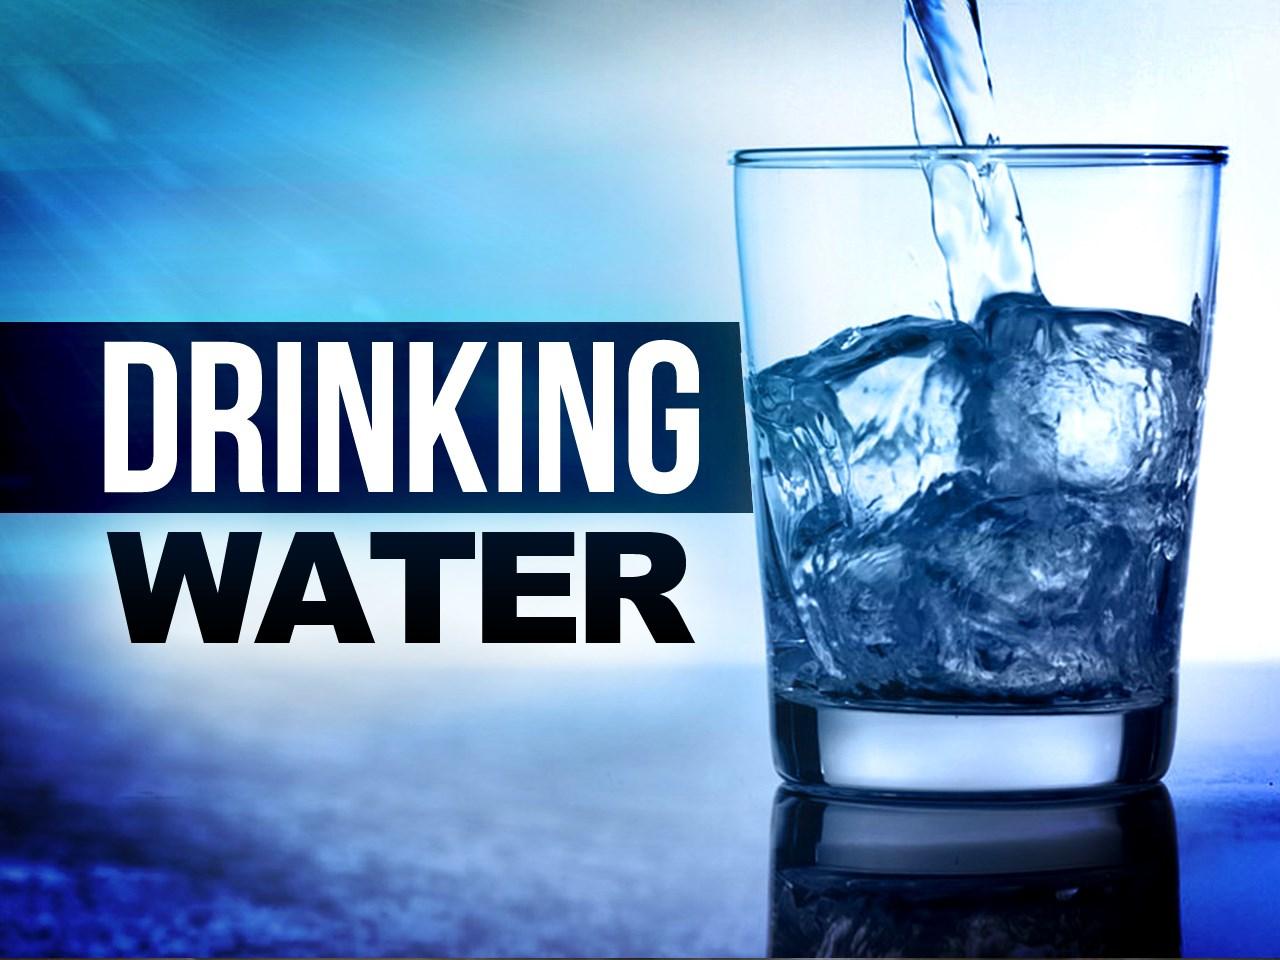 drinking water_1537877986010.jpg.jpg